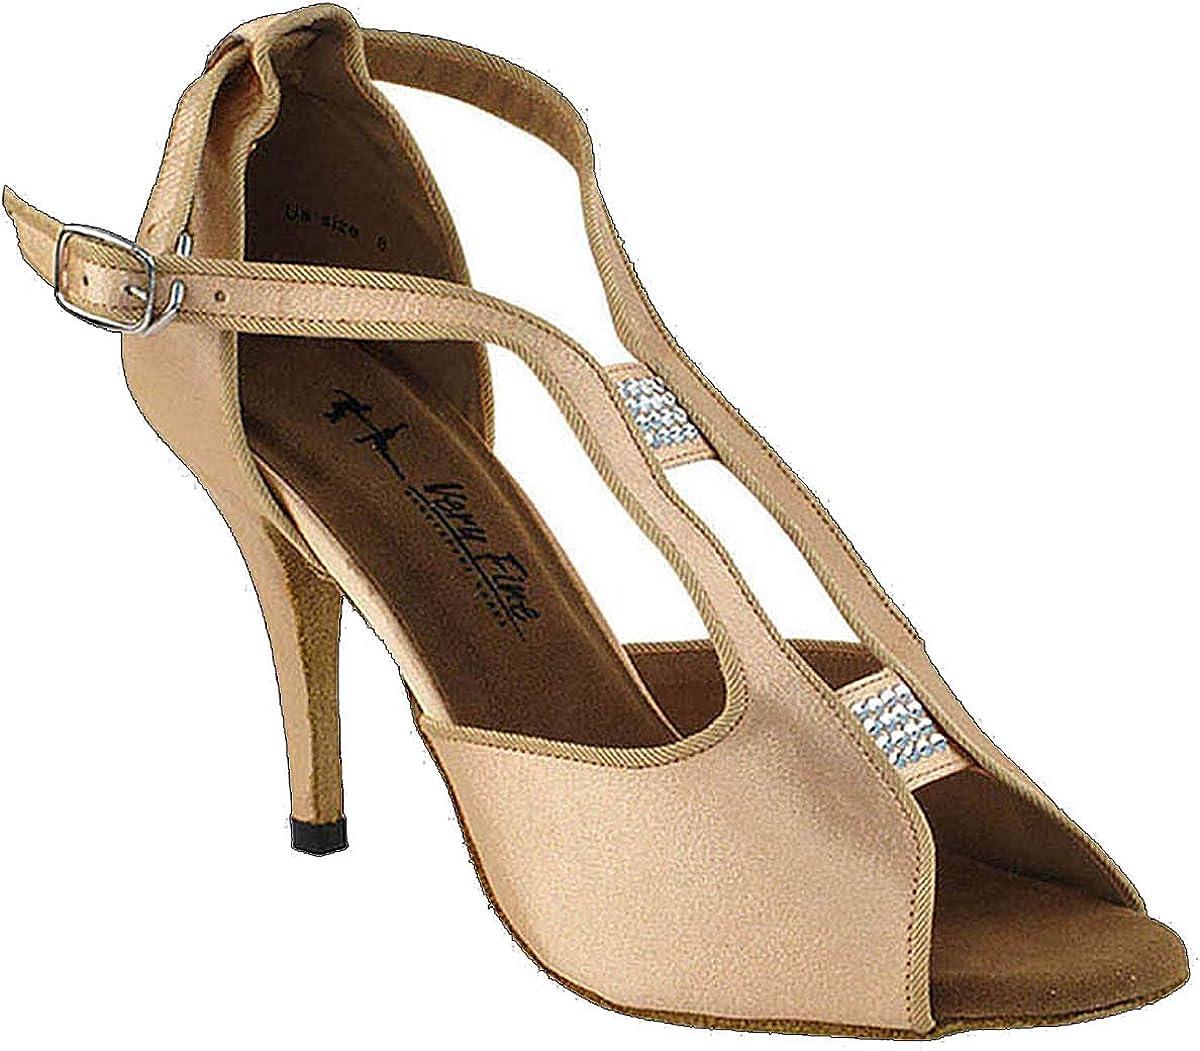 Bargain All items free shipping sale Women Ballroom Dance Shoes Tango Shoe 2825LE Party Wedding Salsa